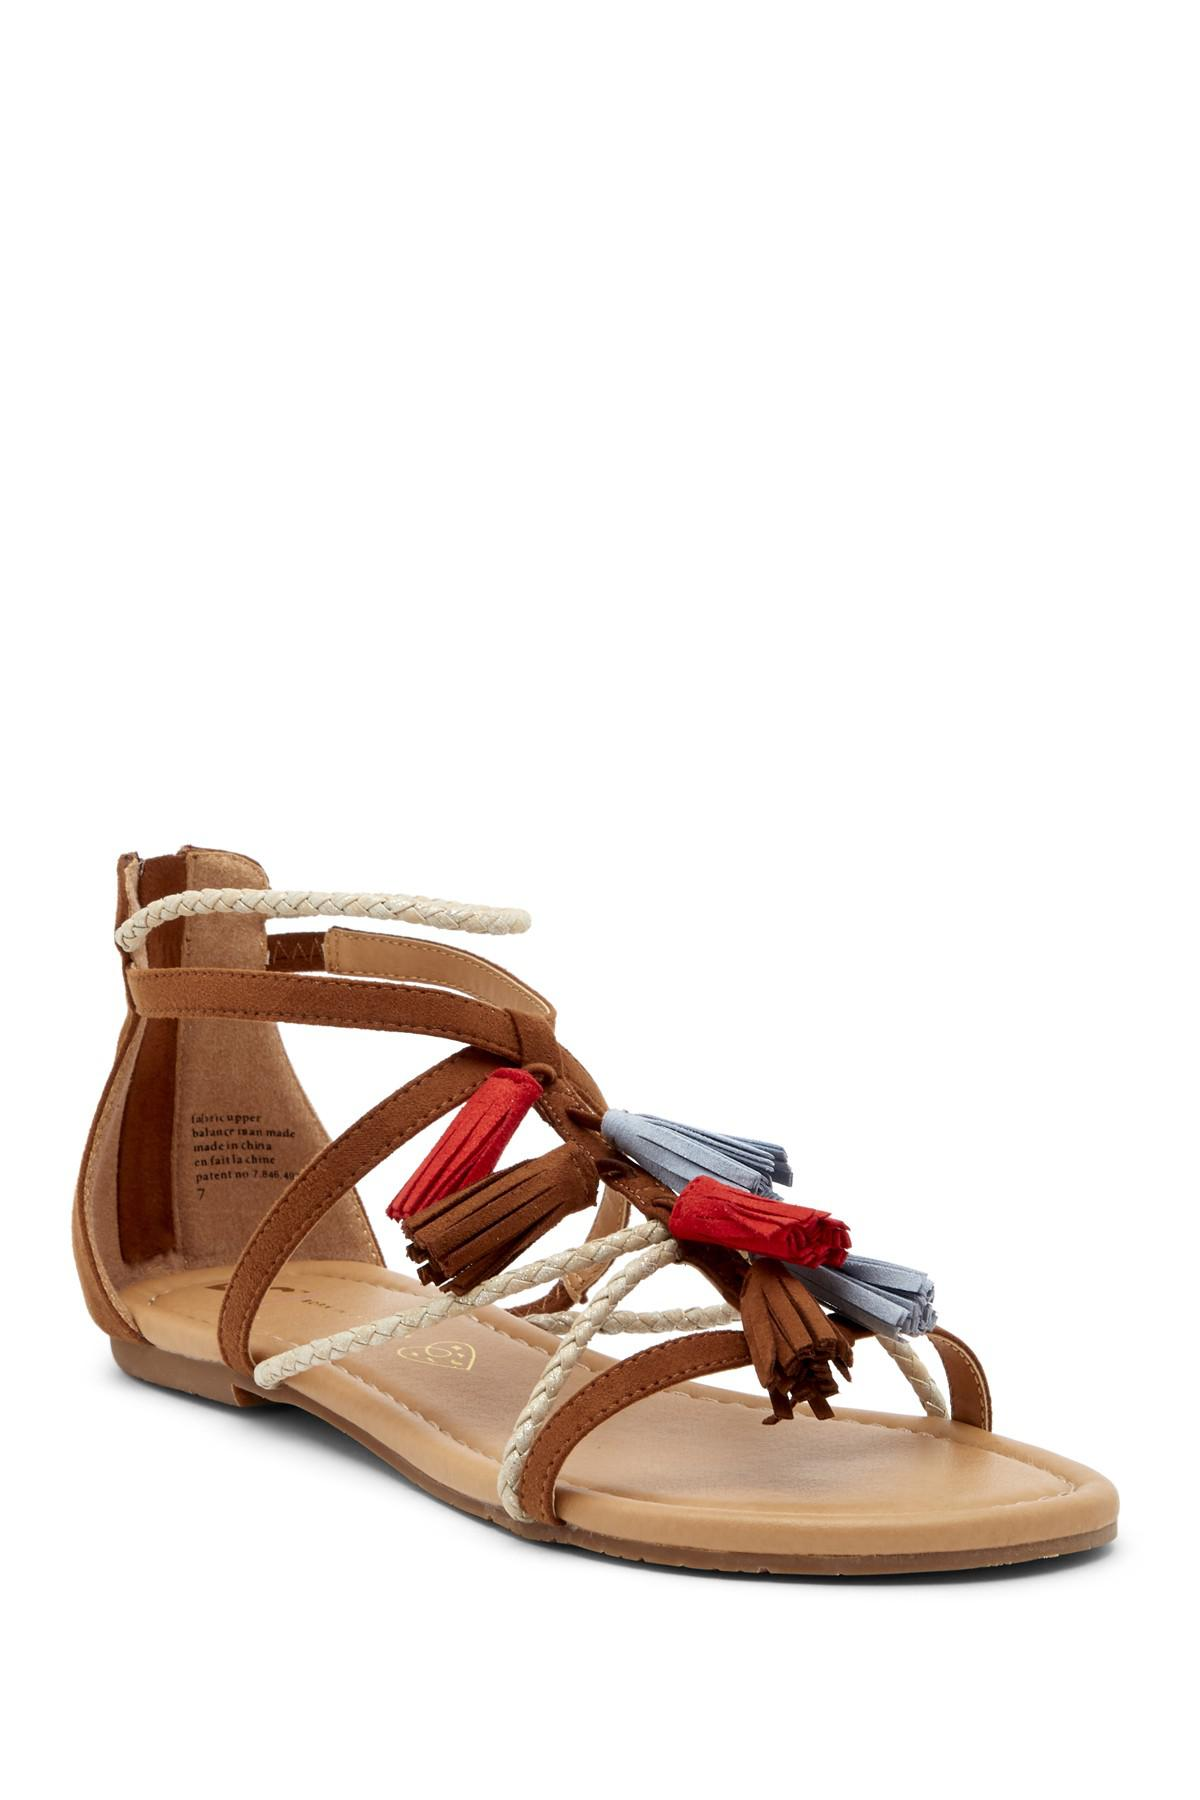 BC Footwear Until Now Tassel Sandal J8xZynb